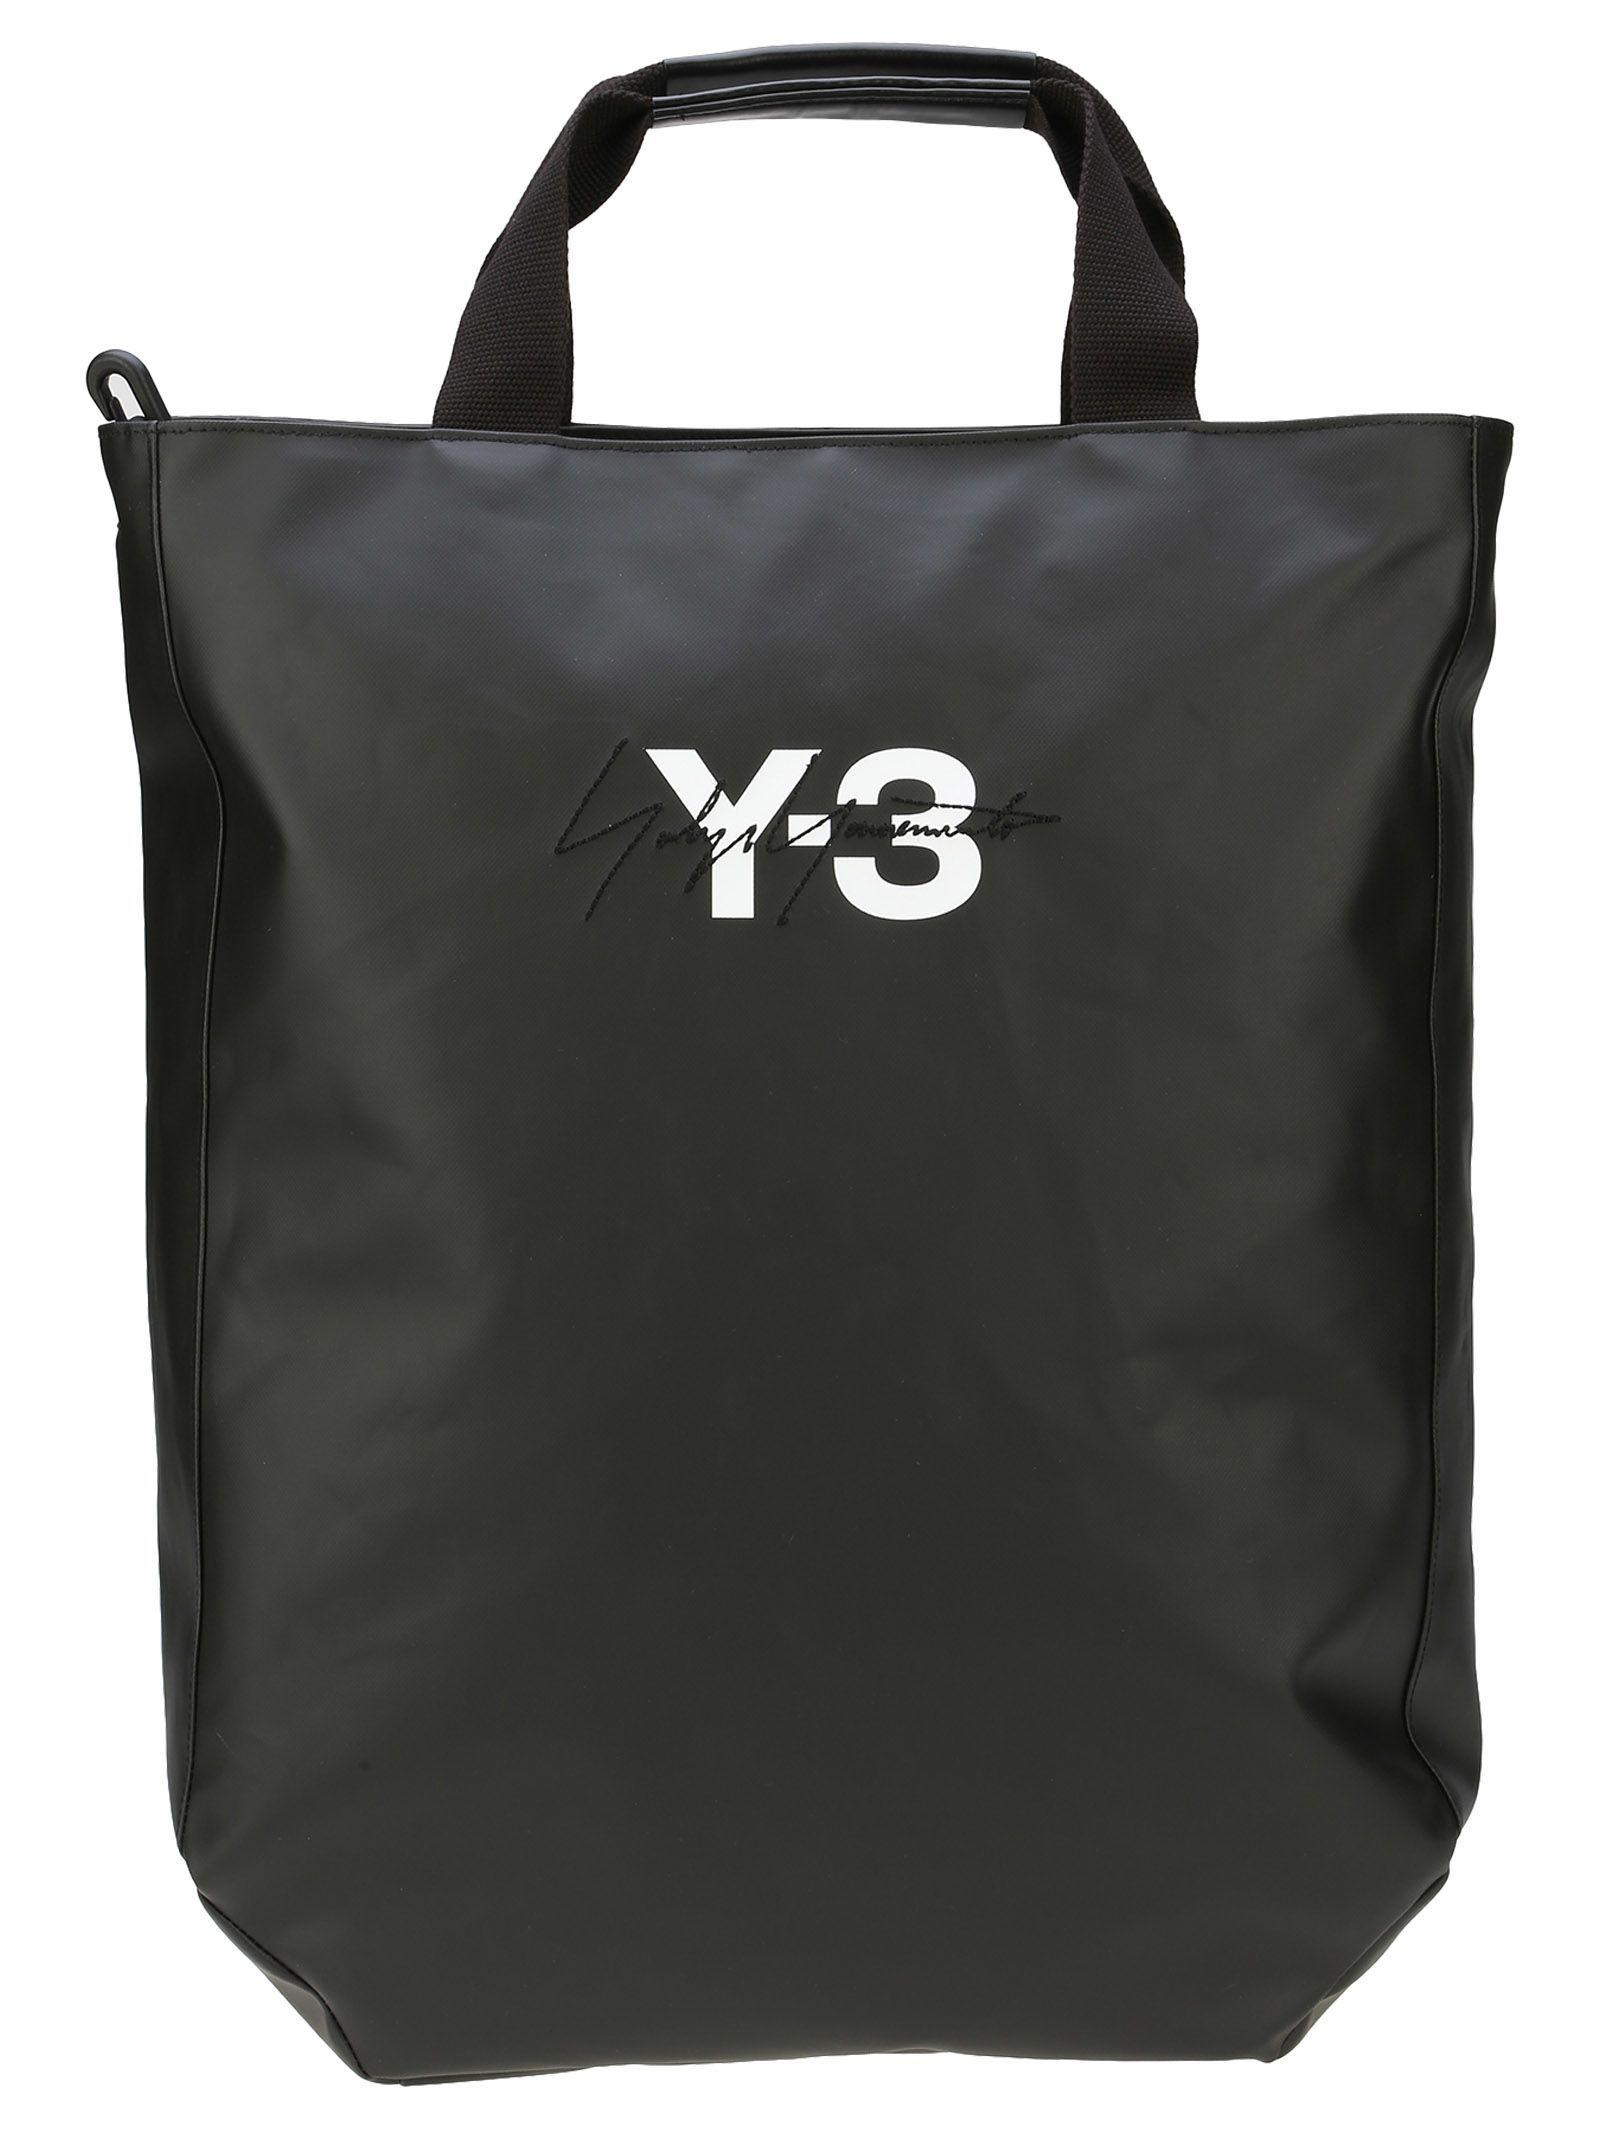 Y-3 ADIDAS Y3 BACKPACK.  y-3  bags  nylon  backpacks     Dr.C ... 2ca2f8fc57